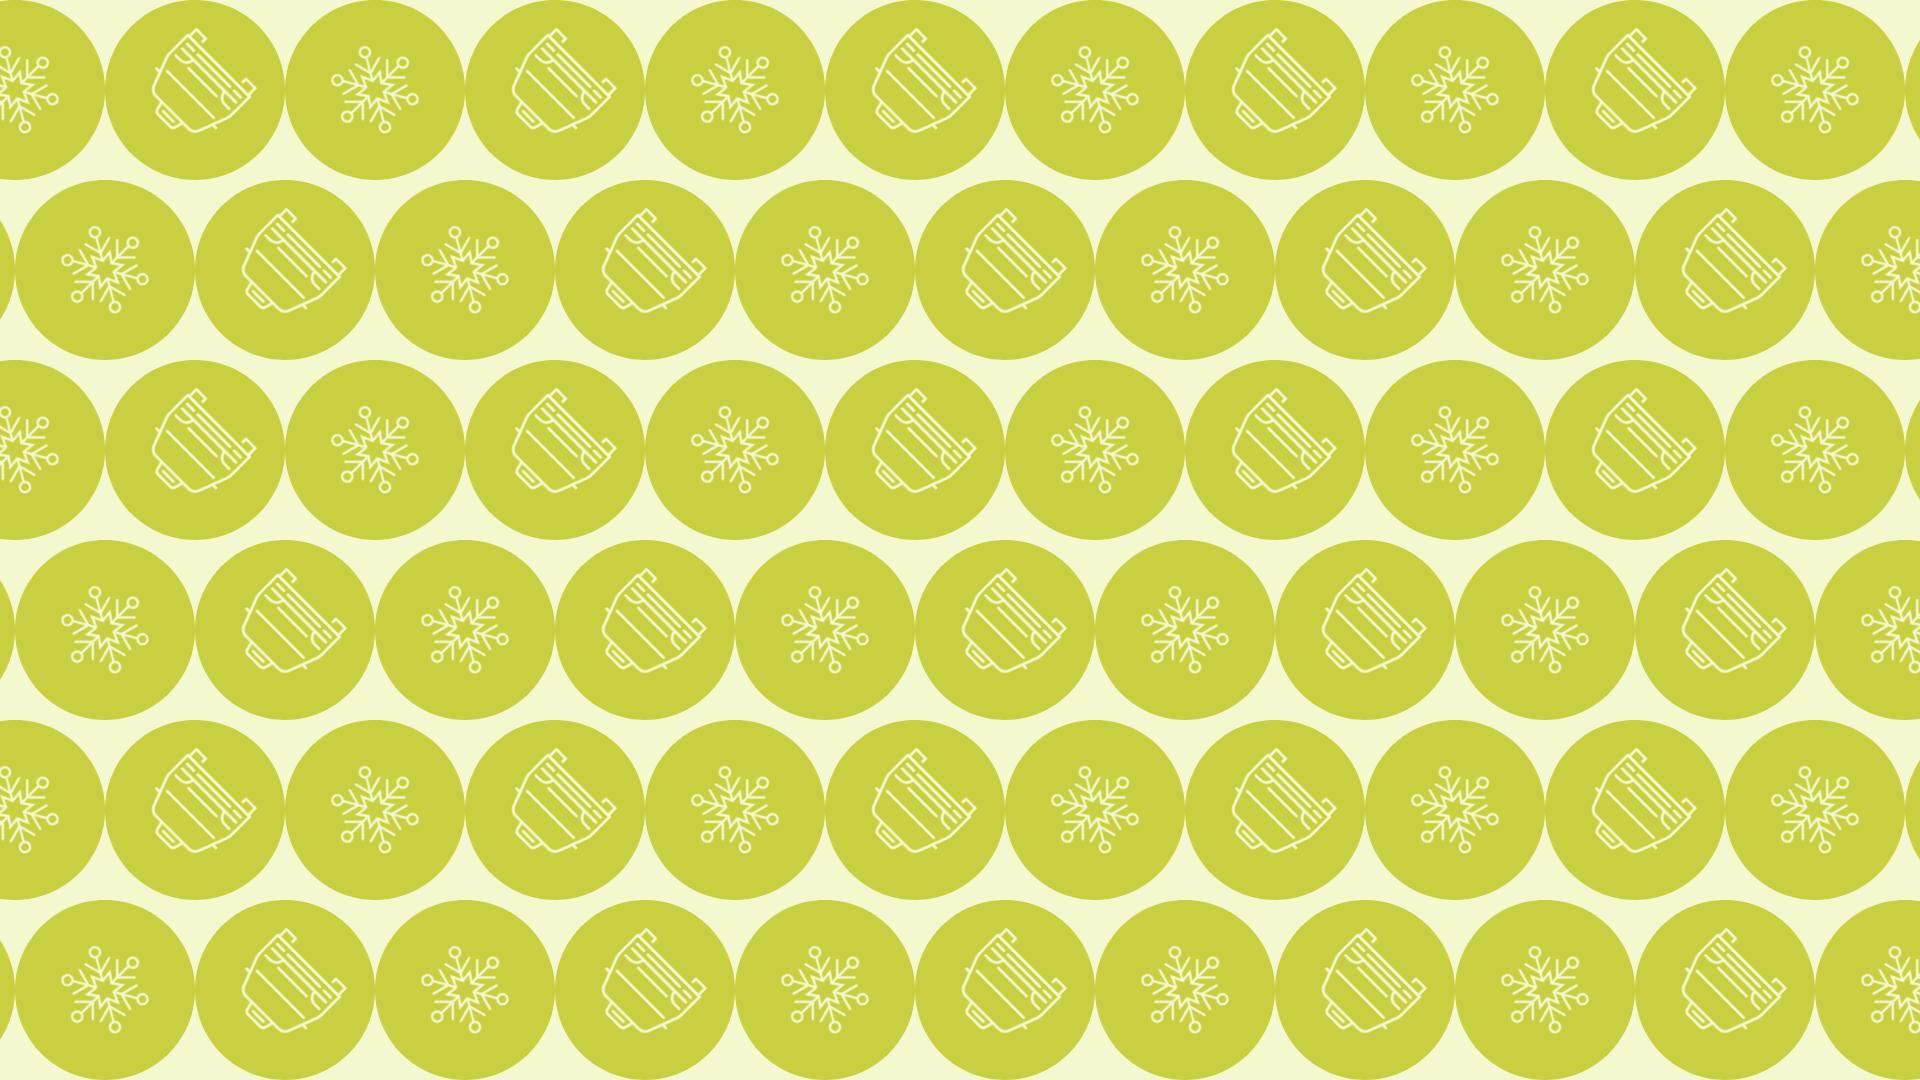 Green, Yellow, Pattern, Line, Font, Design, Circle, Material, Cold, Circles, Snow, Car, Drum,  Free Image